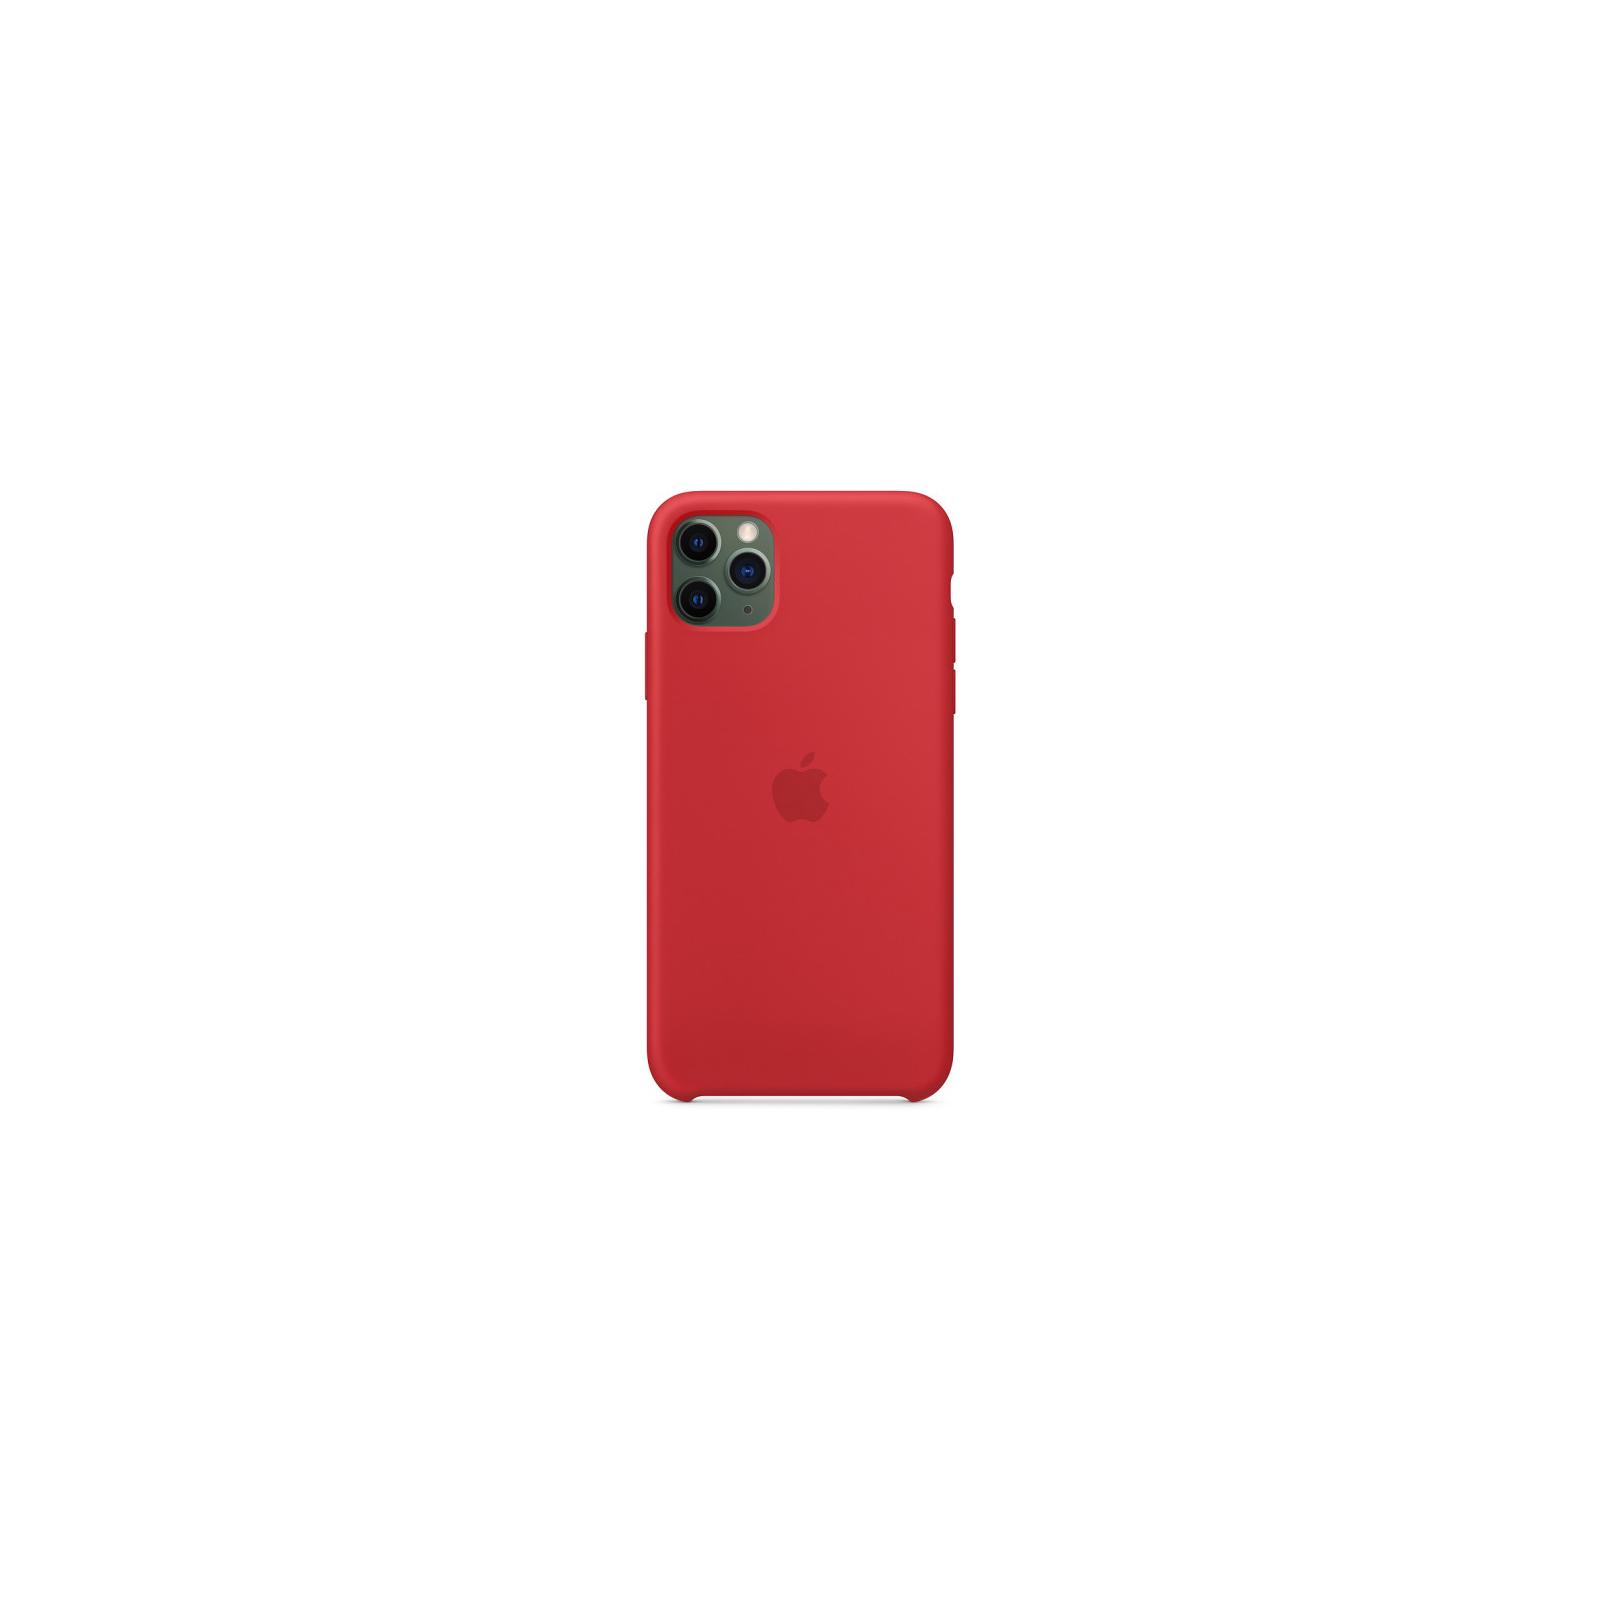 Чехол для моб. телефона Apple iPhone 11 Pro Max Silicone Case - Pine Green (MX012ZM/A) изображение 3